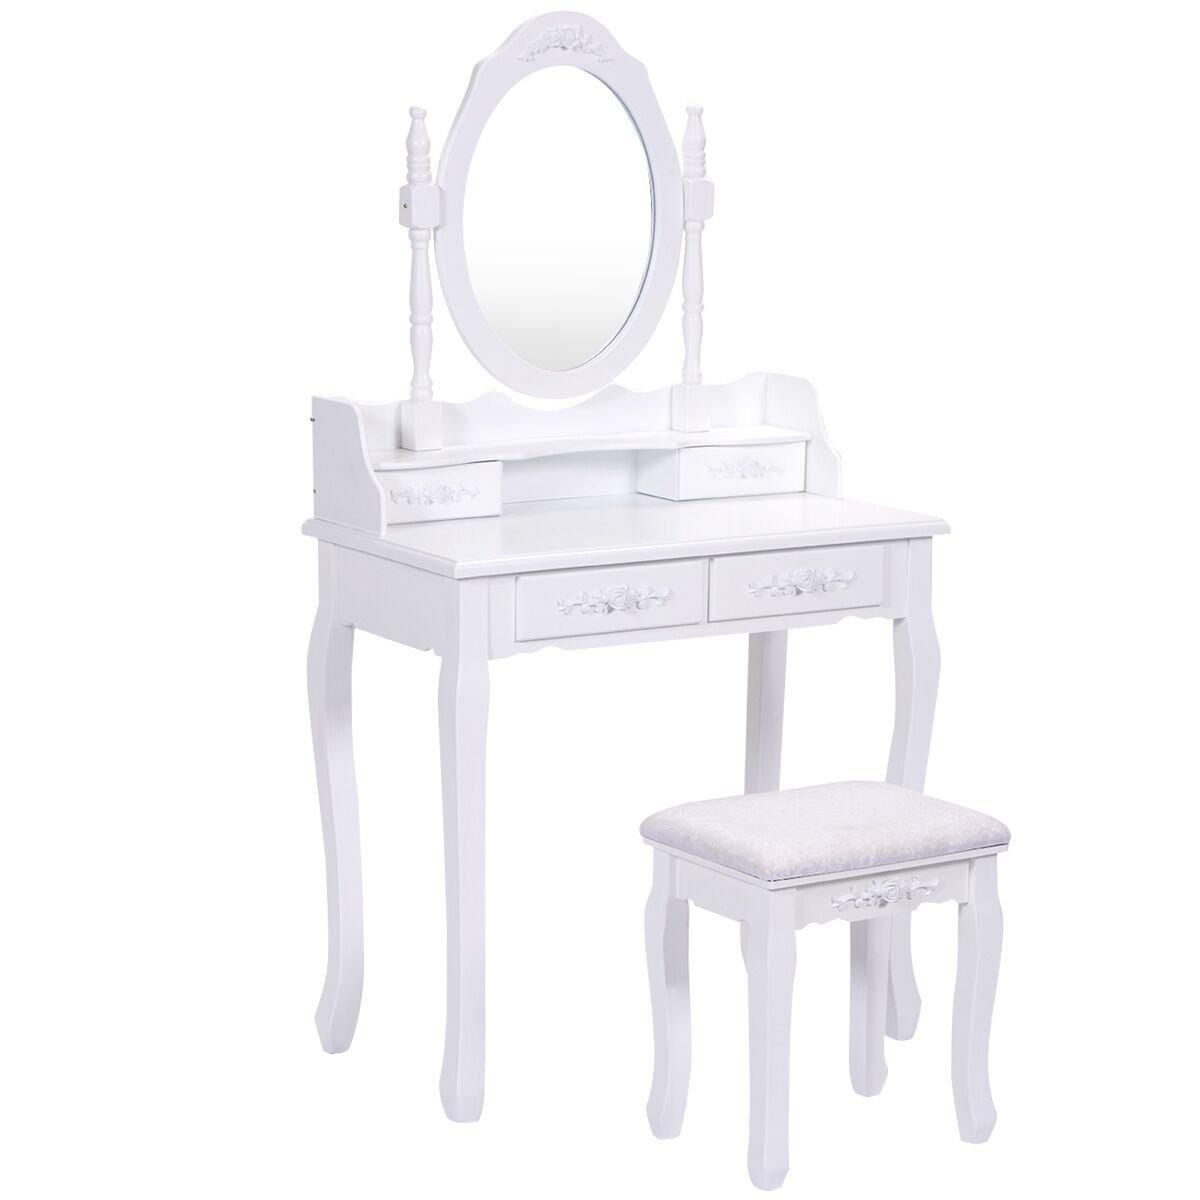 Giantex Vanity Wood Makeup Dressing Table Stool Set Bedroom with Mirror (Round Mirror, 4 Drawers)